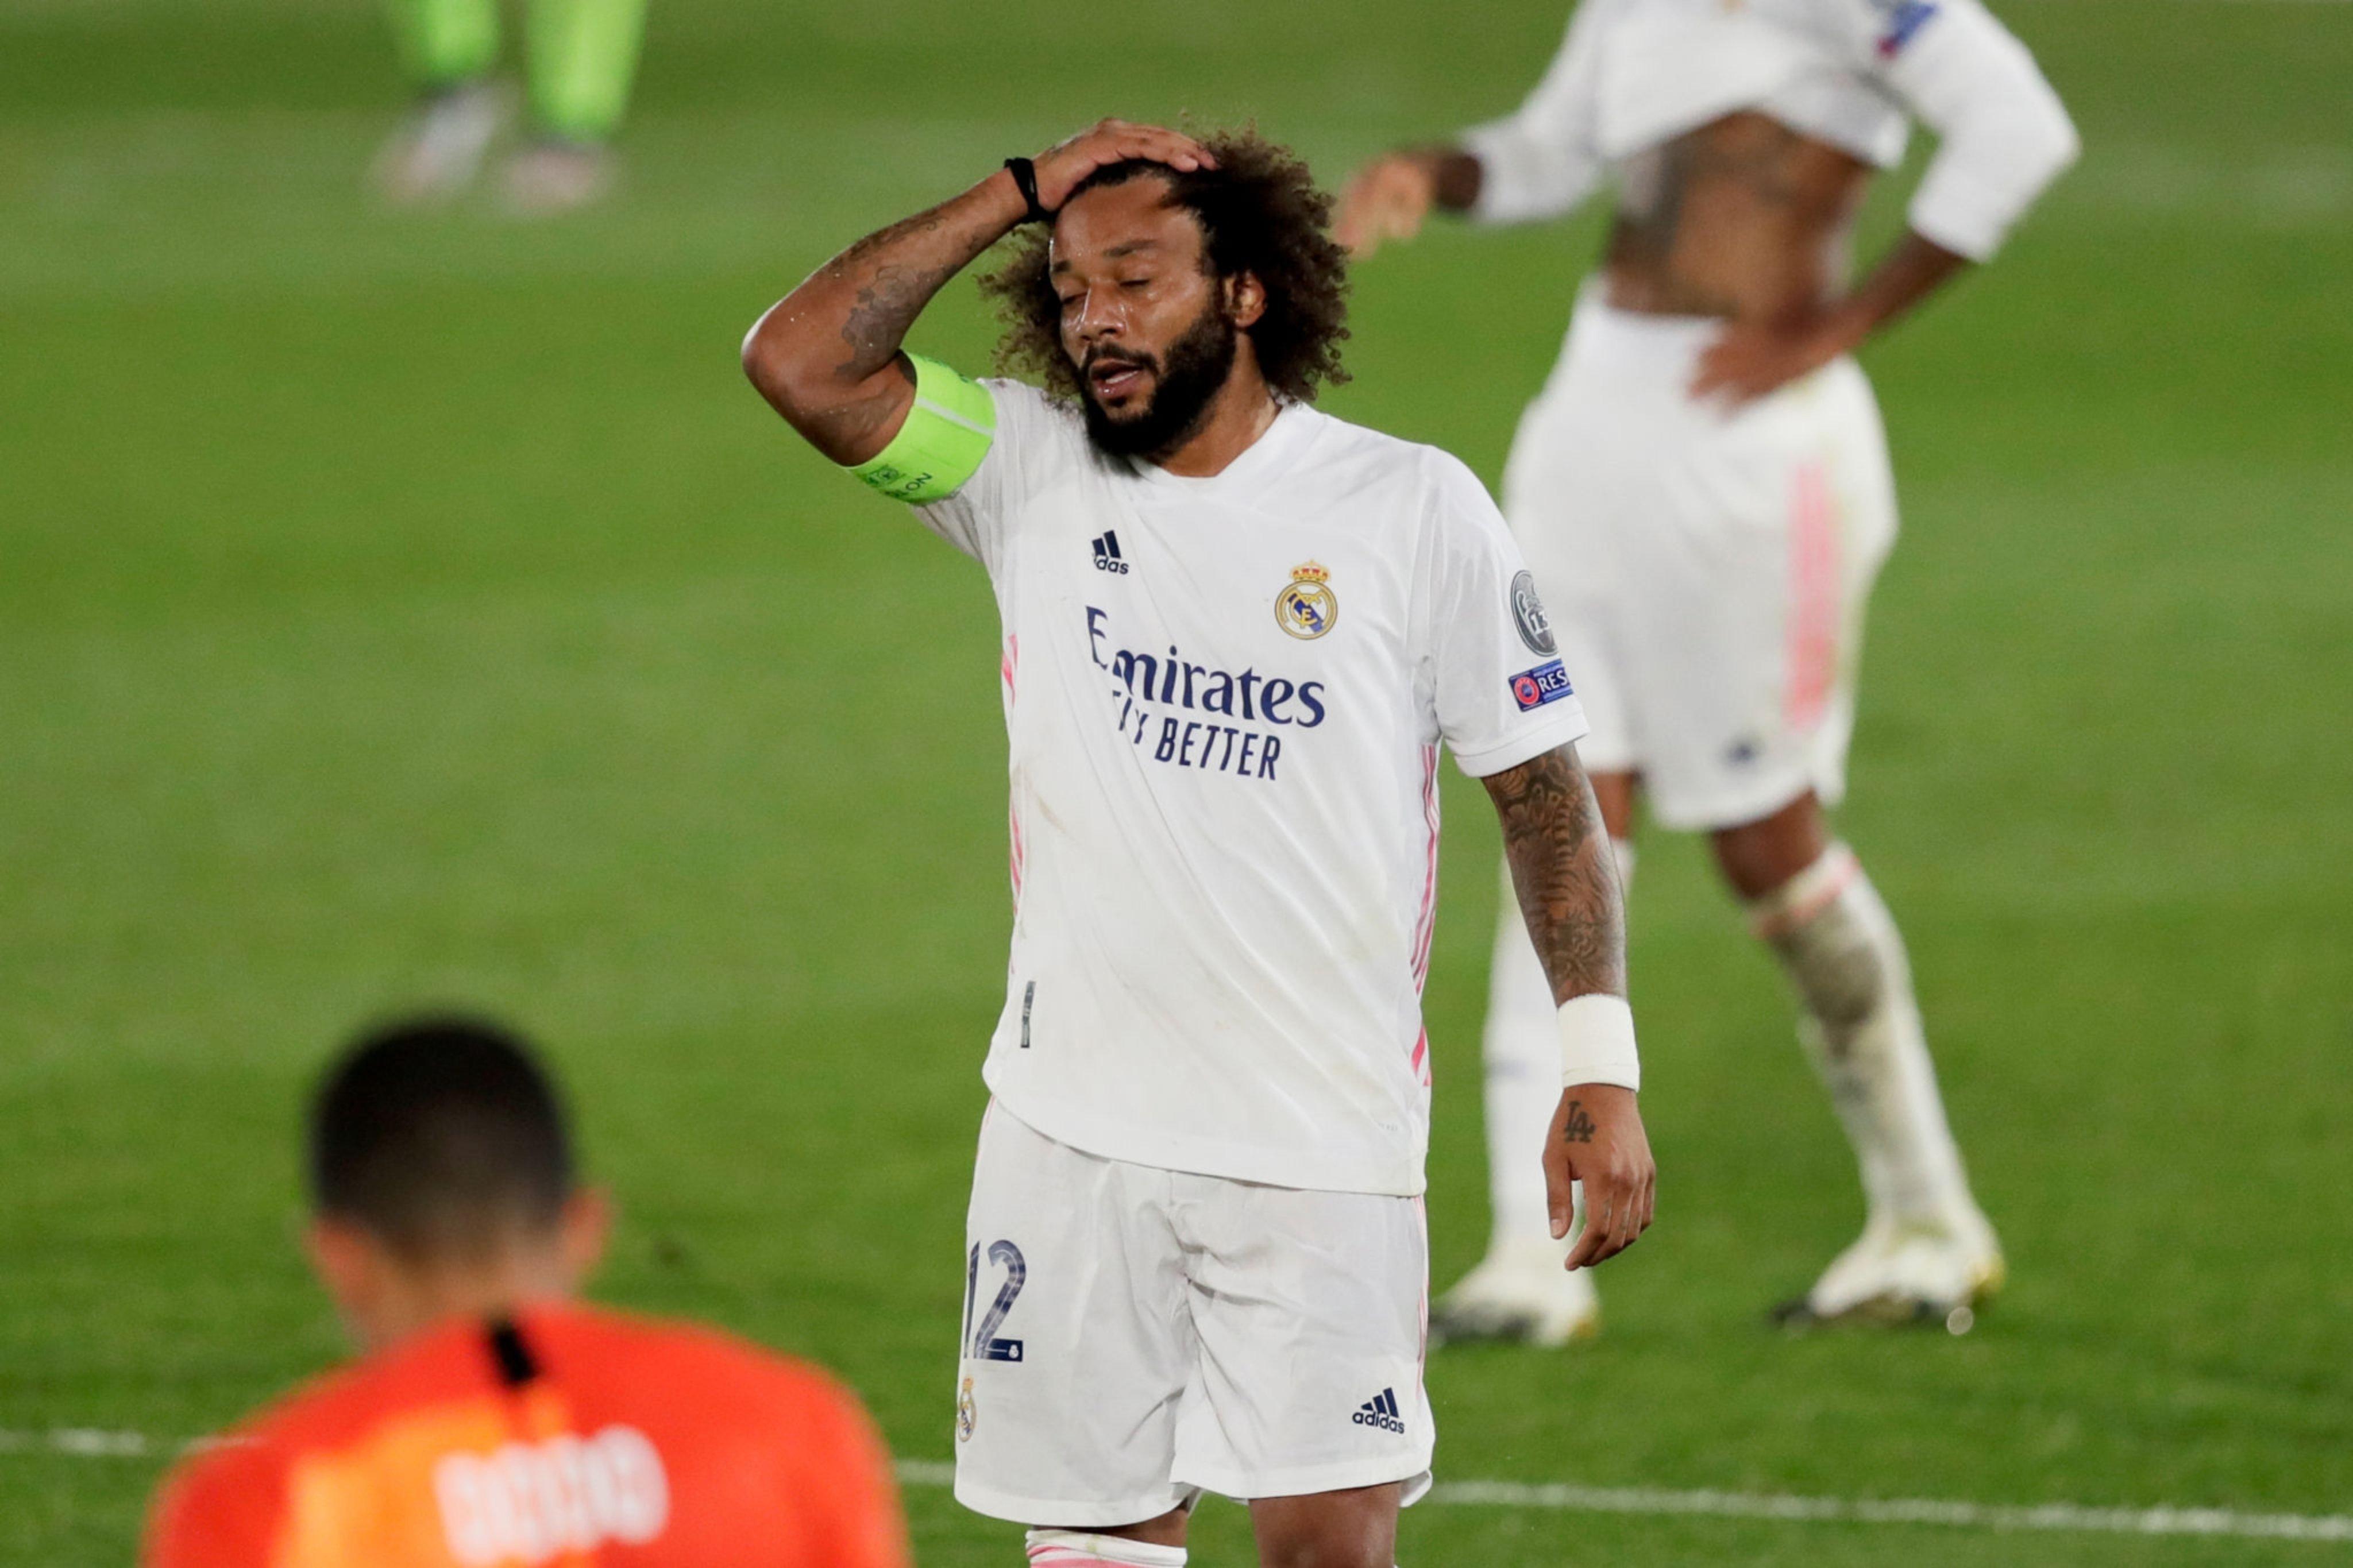 رئال مادرید / لیگ قهرمانان اروپا / Real Madrid / Uefa Champions League